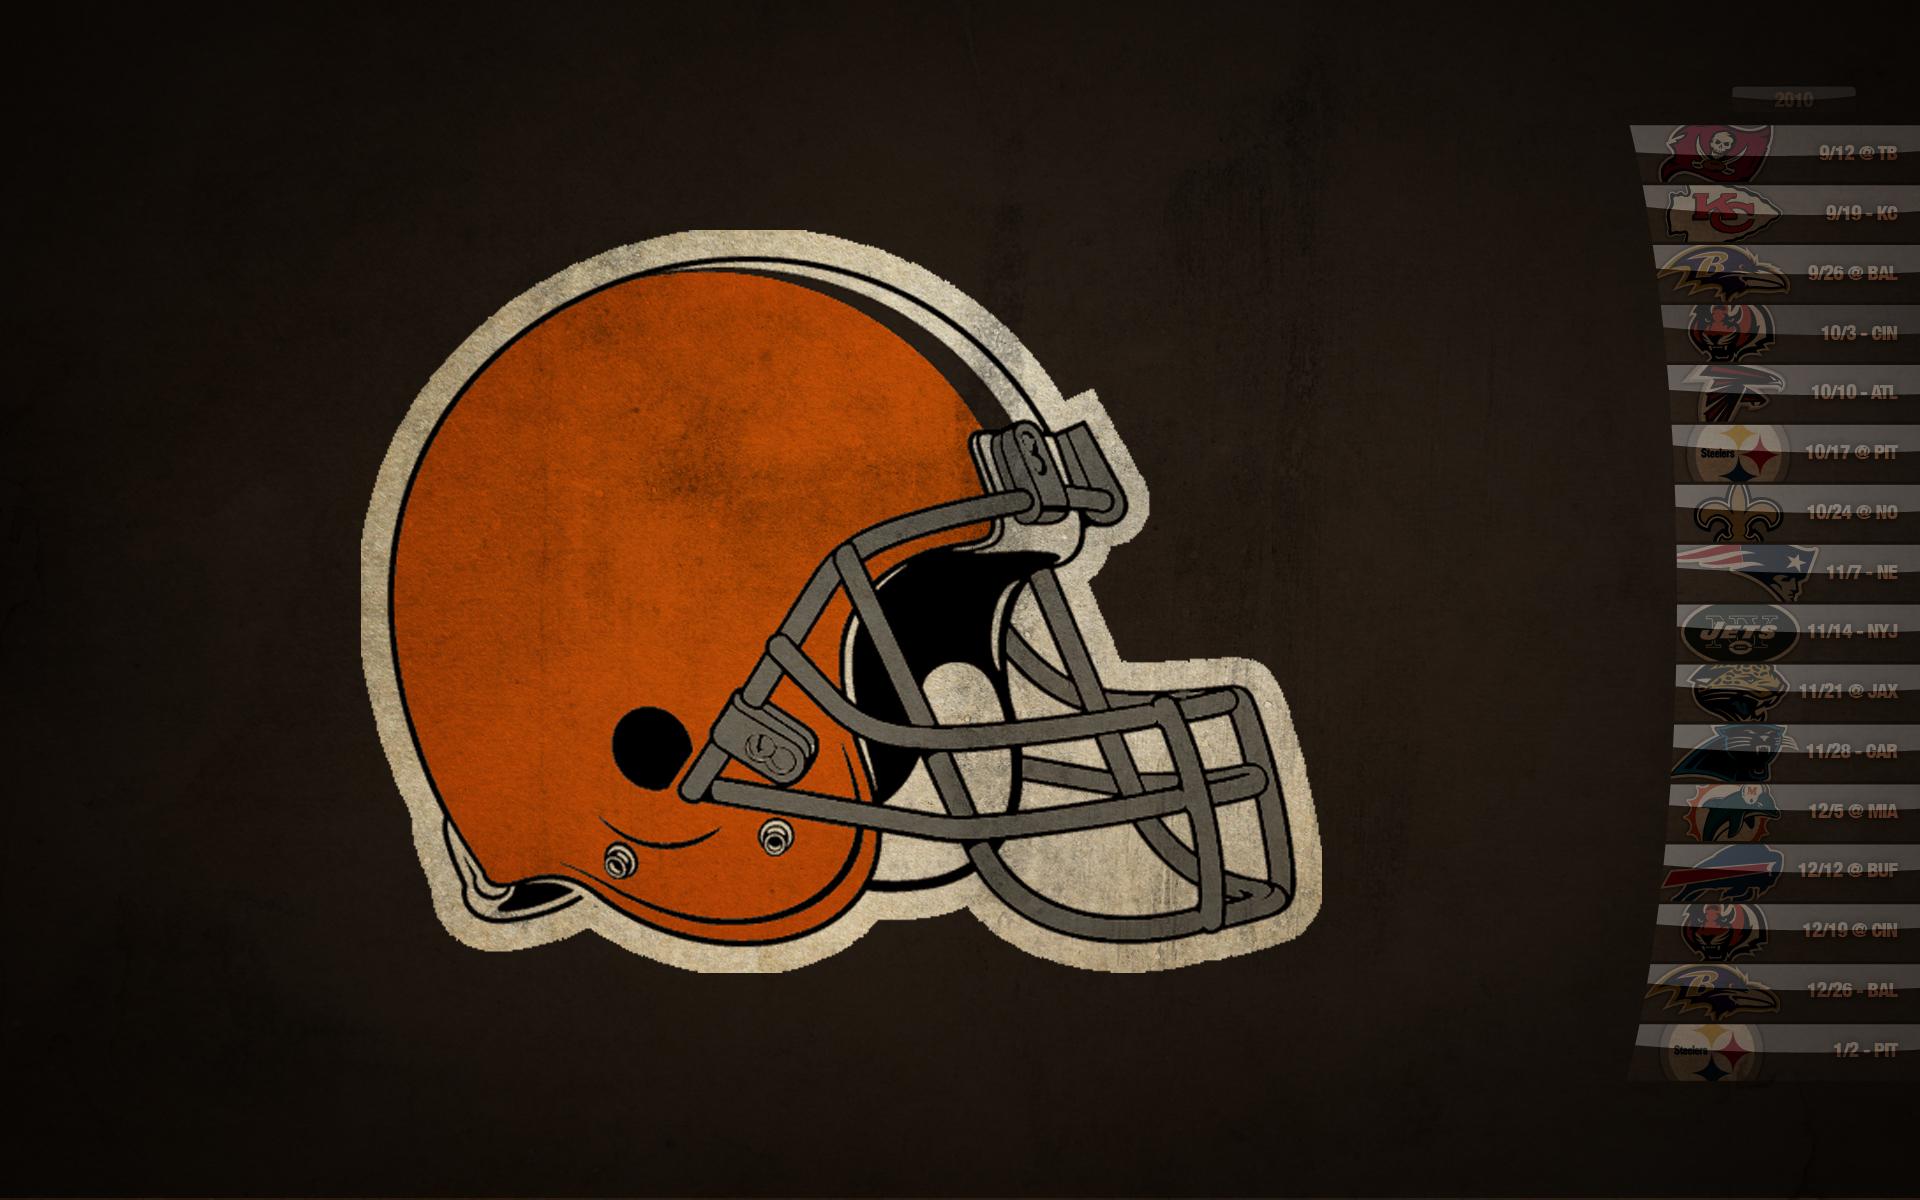 New Cleveland Browns Logo Wallpaper - WallpaperSafari